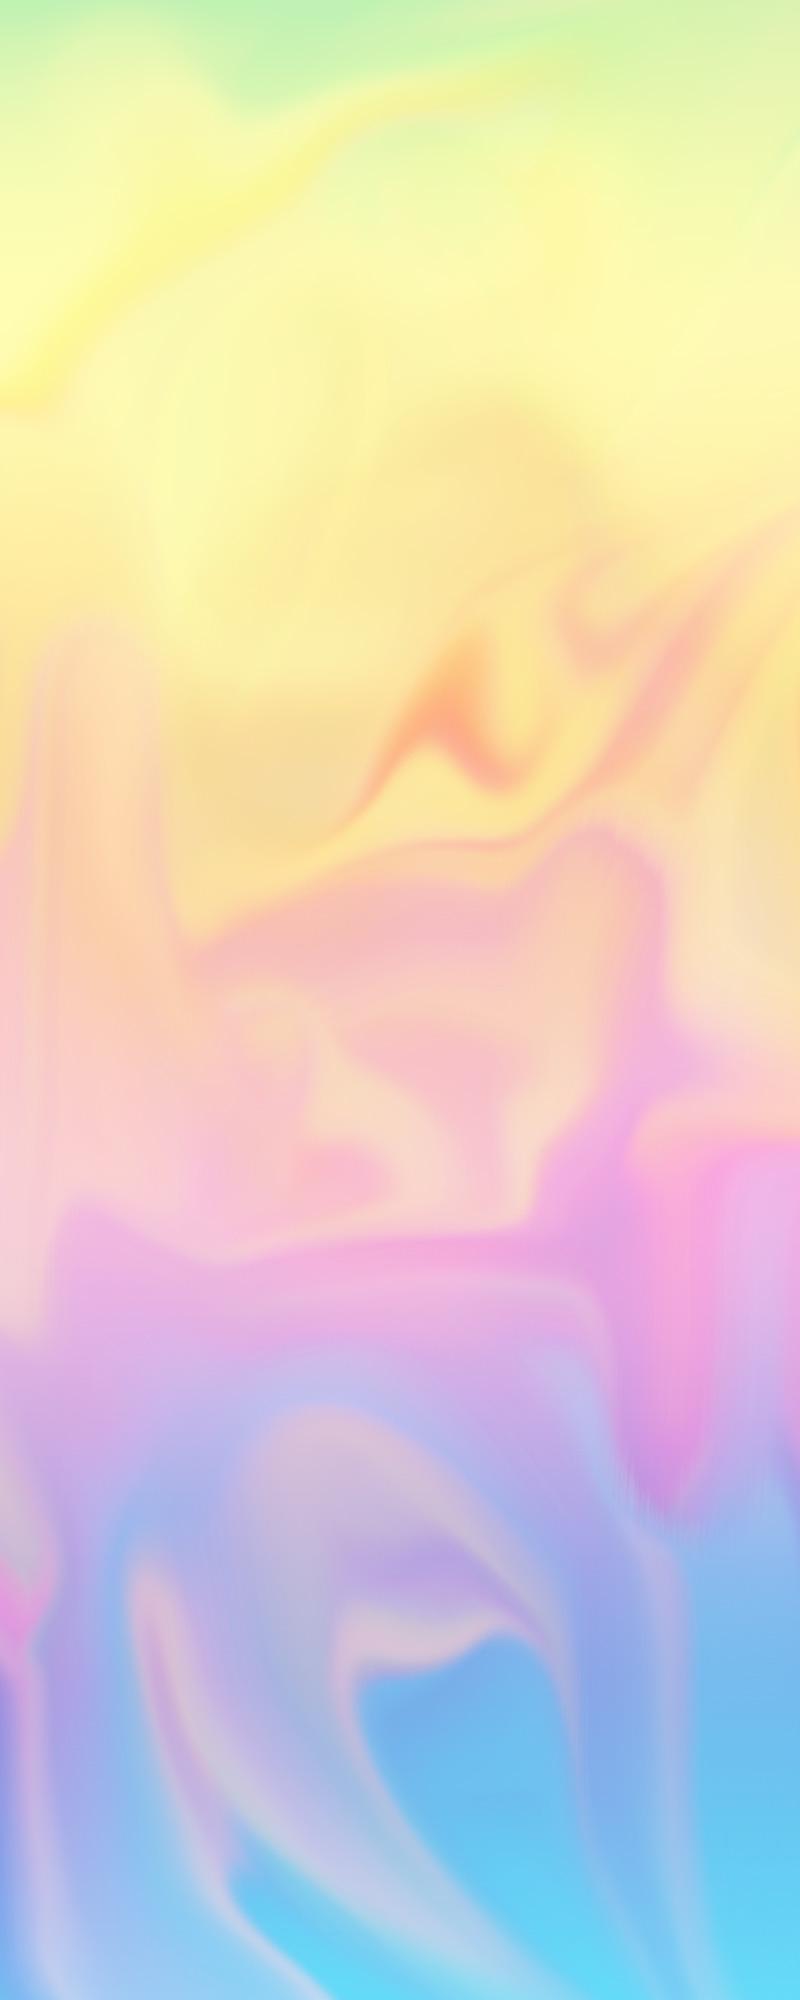 tumblr pastel backgrounds - photo #32